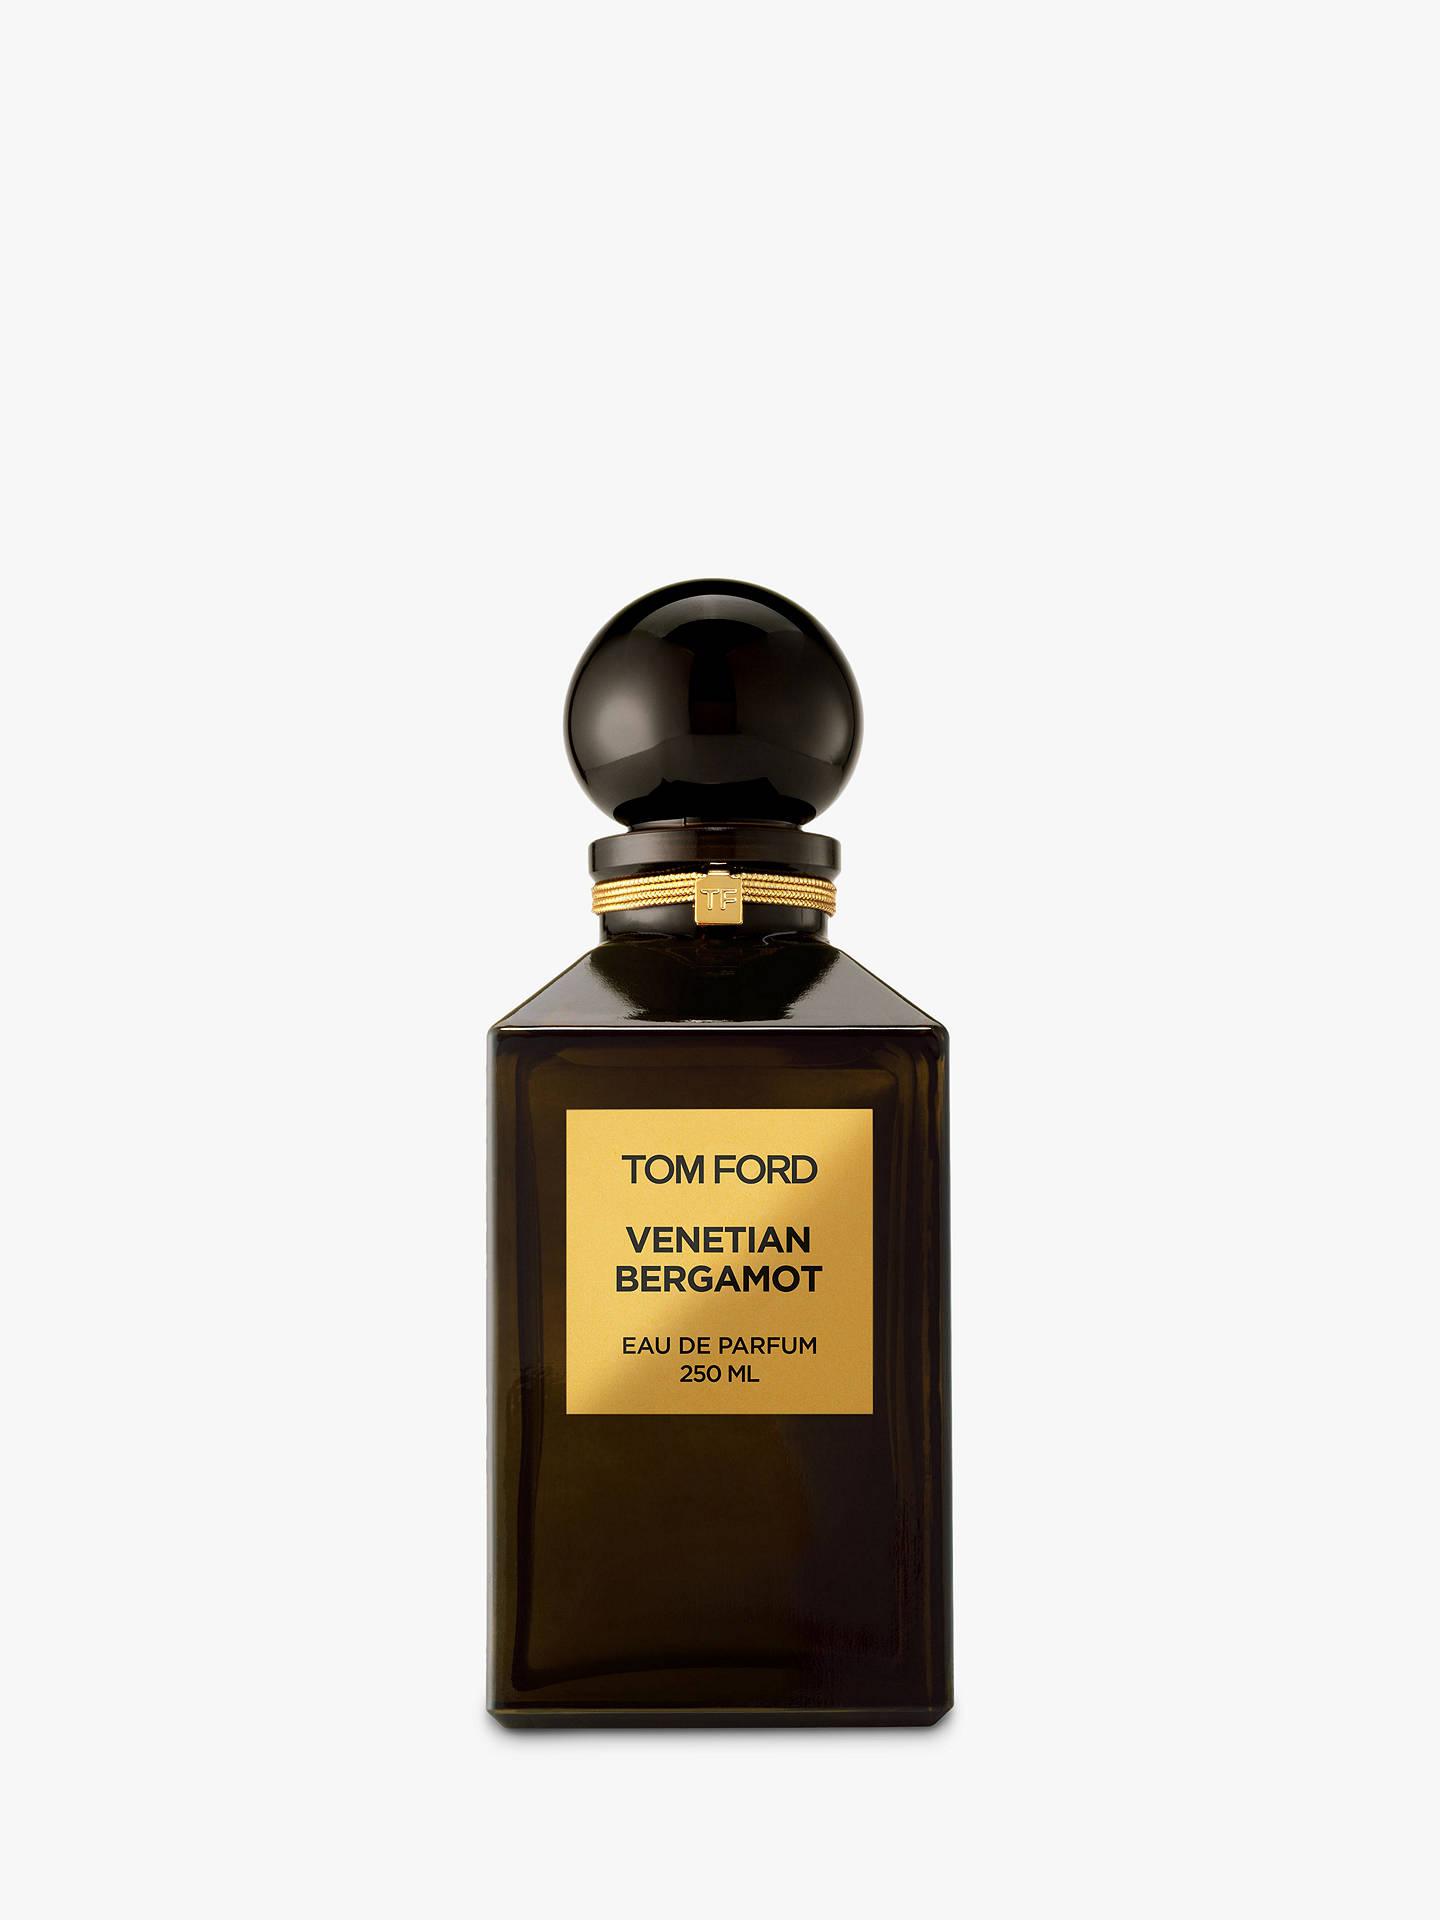 Tom Ford Private Blend Venetian Bergamot Eau De Parfum 250ml At Original Adidas Get Ready Buytom Online